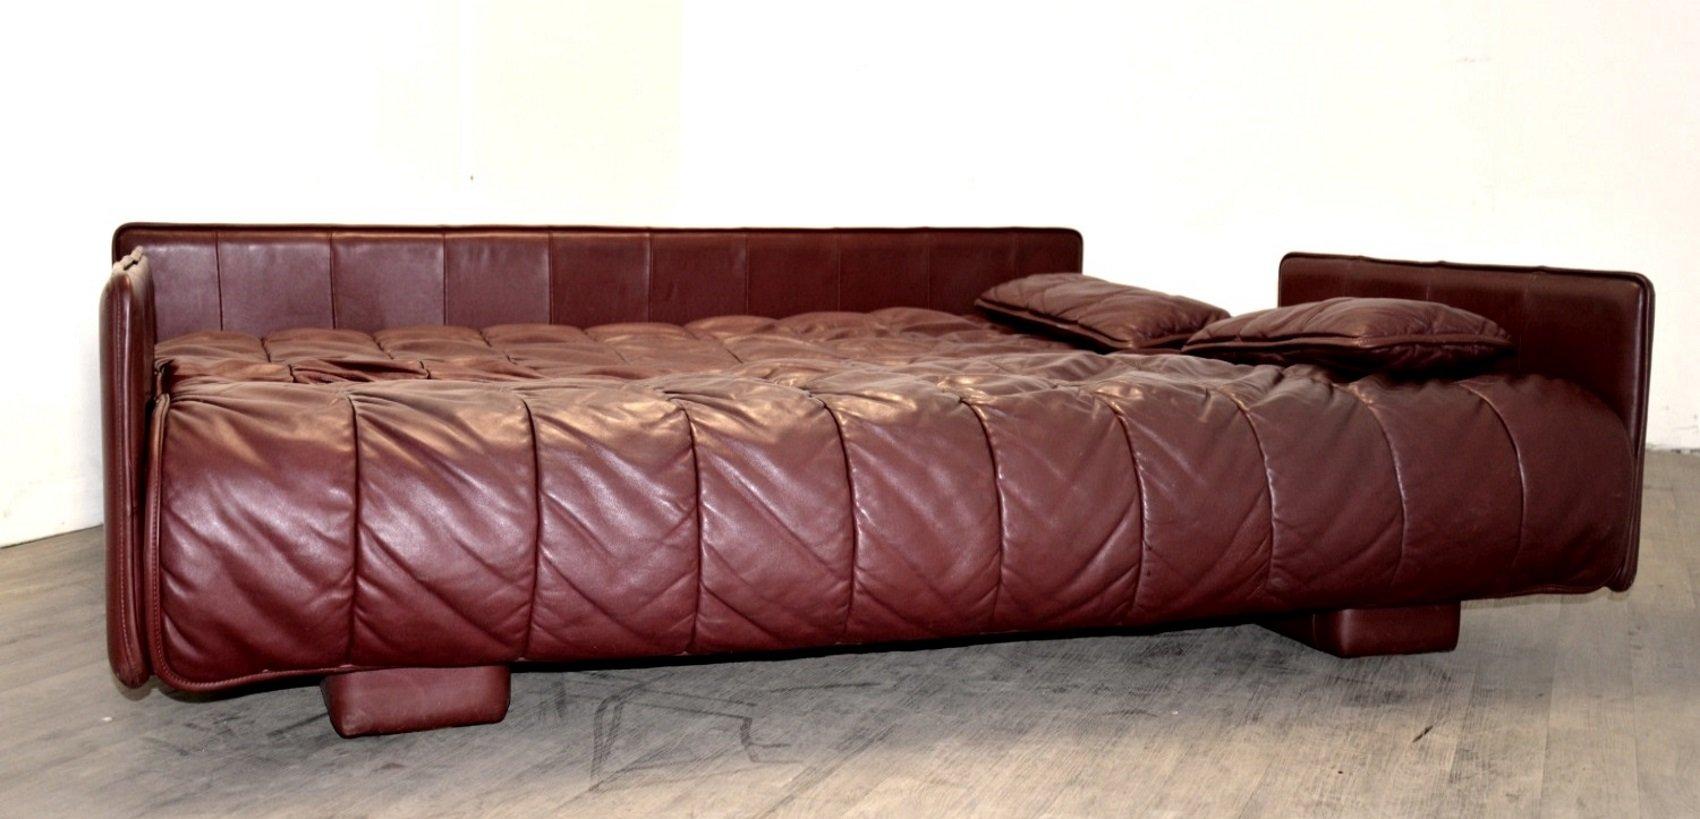 schweizer leder schlafsofa von de sede 1970er bei pamono. Black Bedroom Furniture Sets. Home Design Ideas